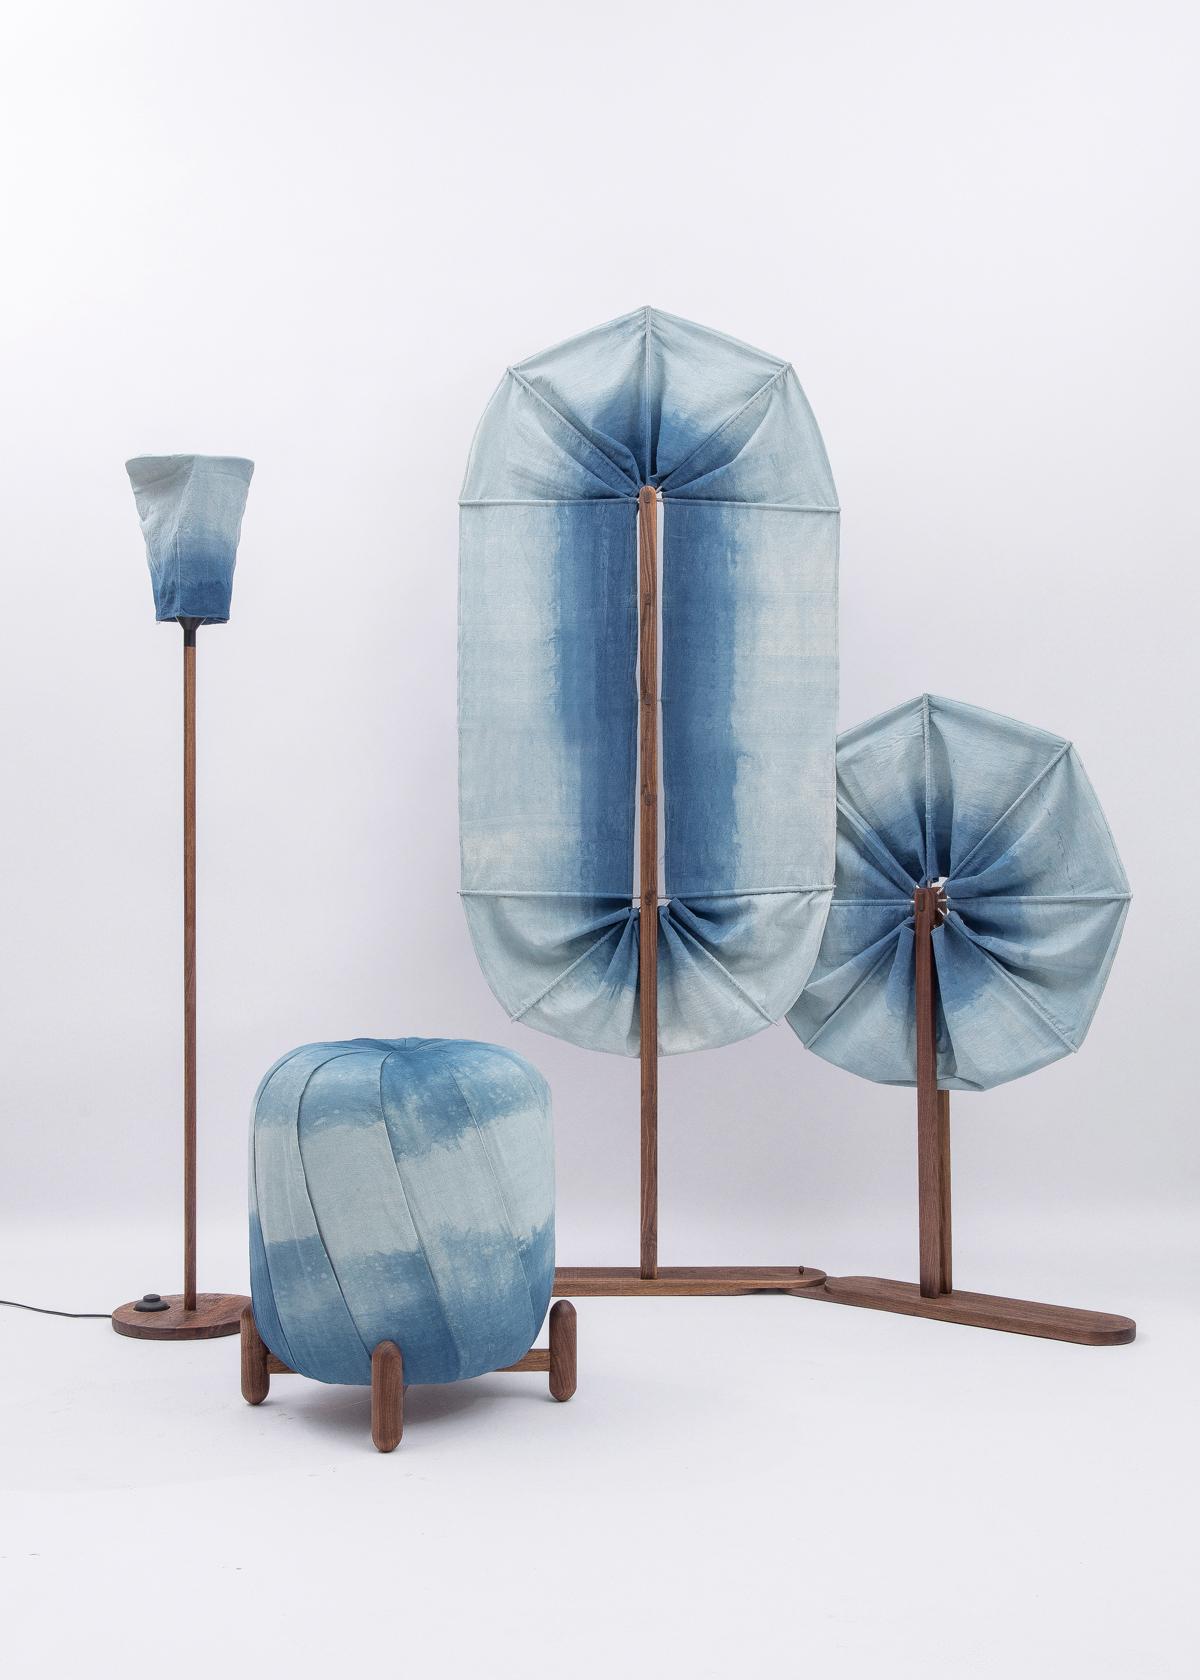 Salone Satellite, designed by Wuluena Bao